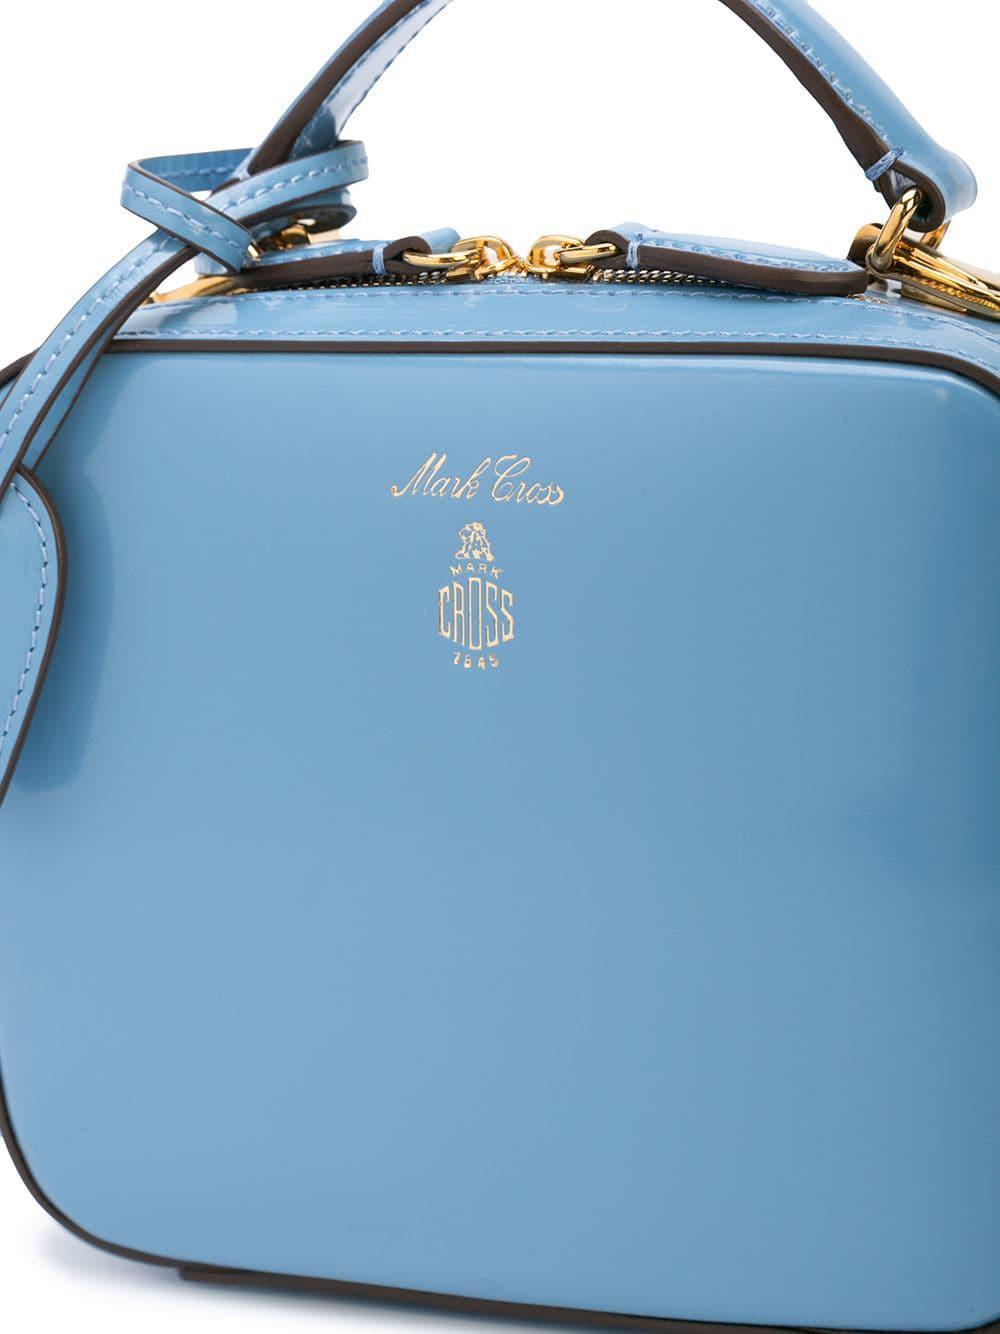 Mark Cross Leather Vintage Style Mini-tote Handbag in Blue